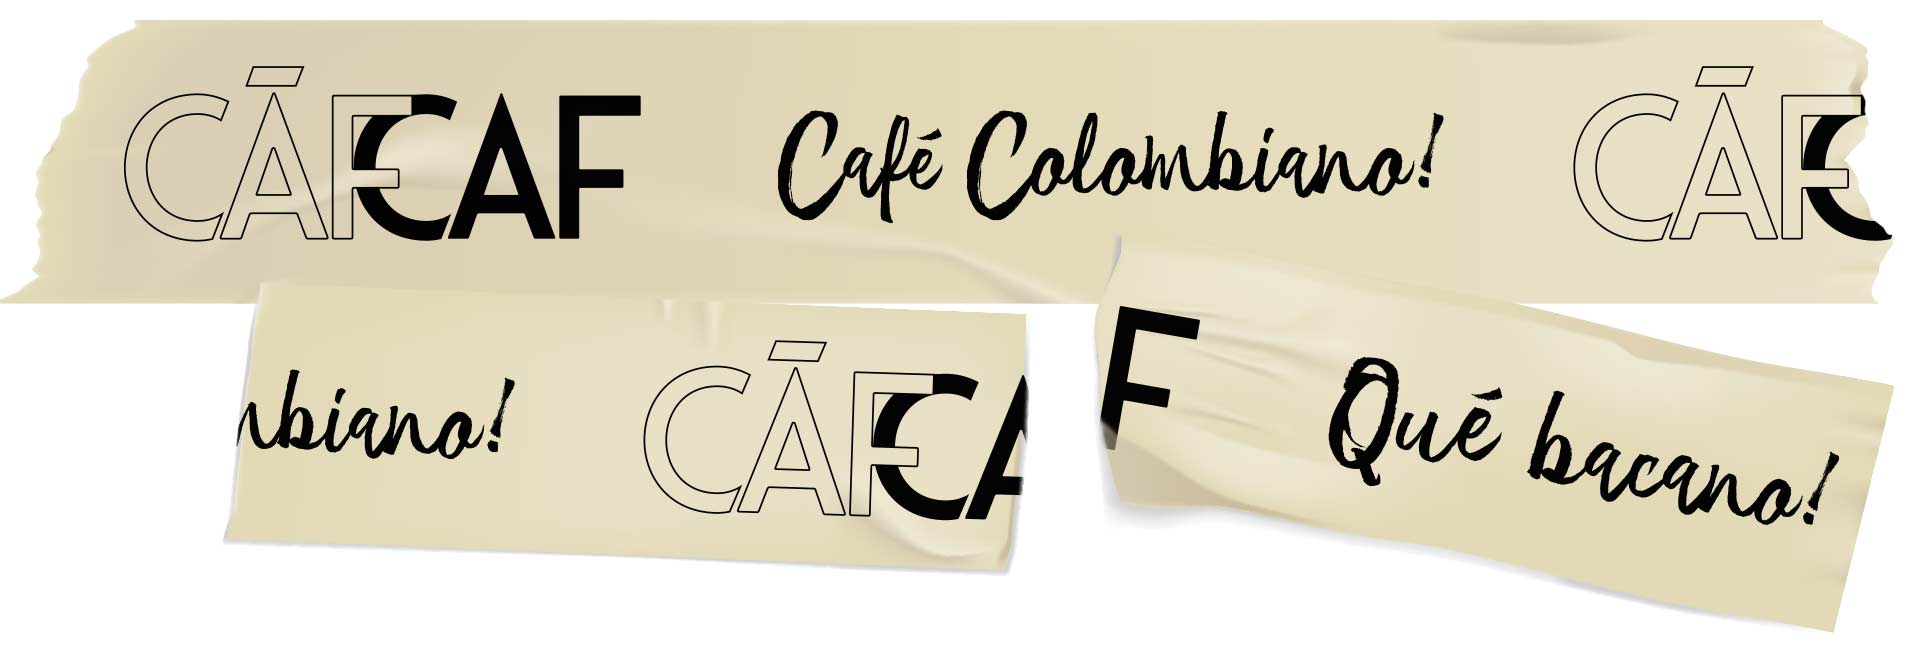 CafCaf Kaffeeshop und Blog: Corporate Klebeband